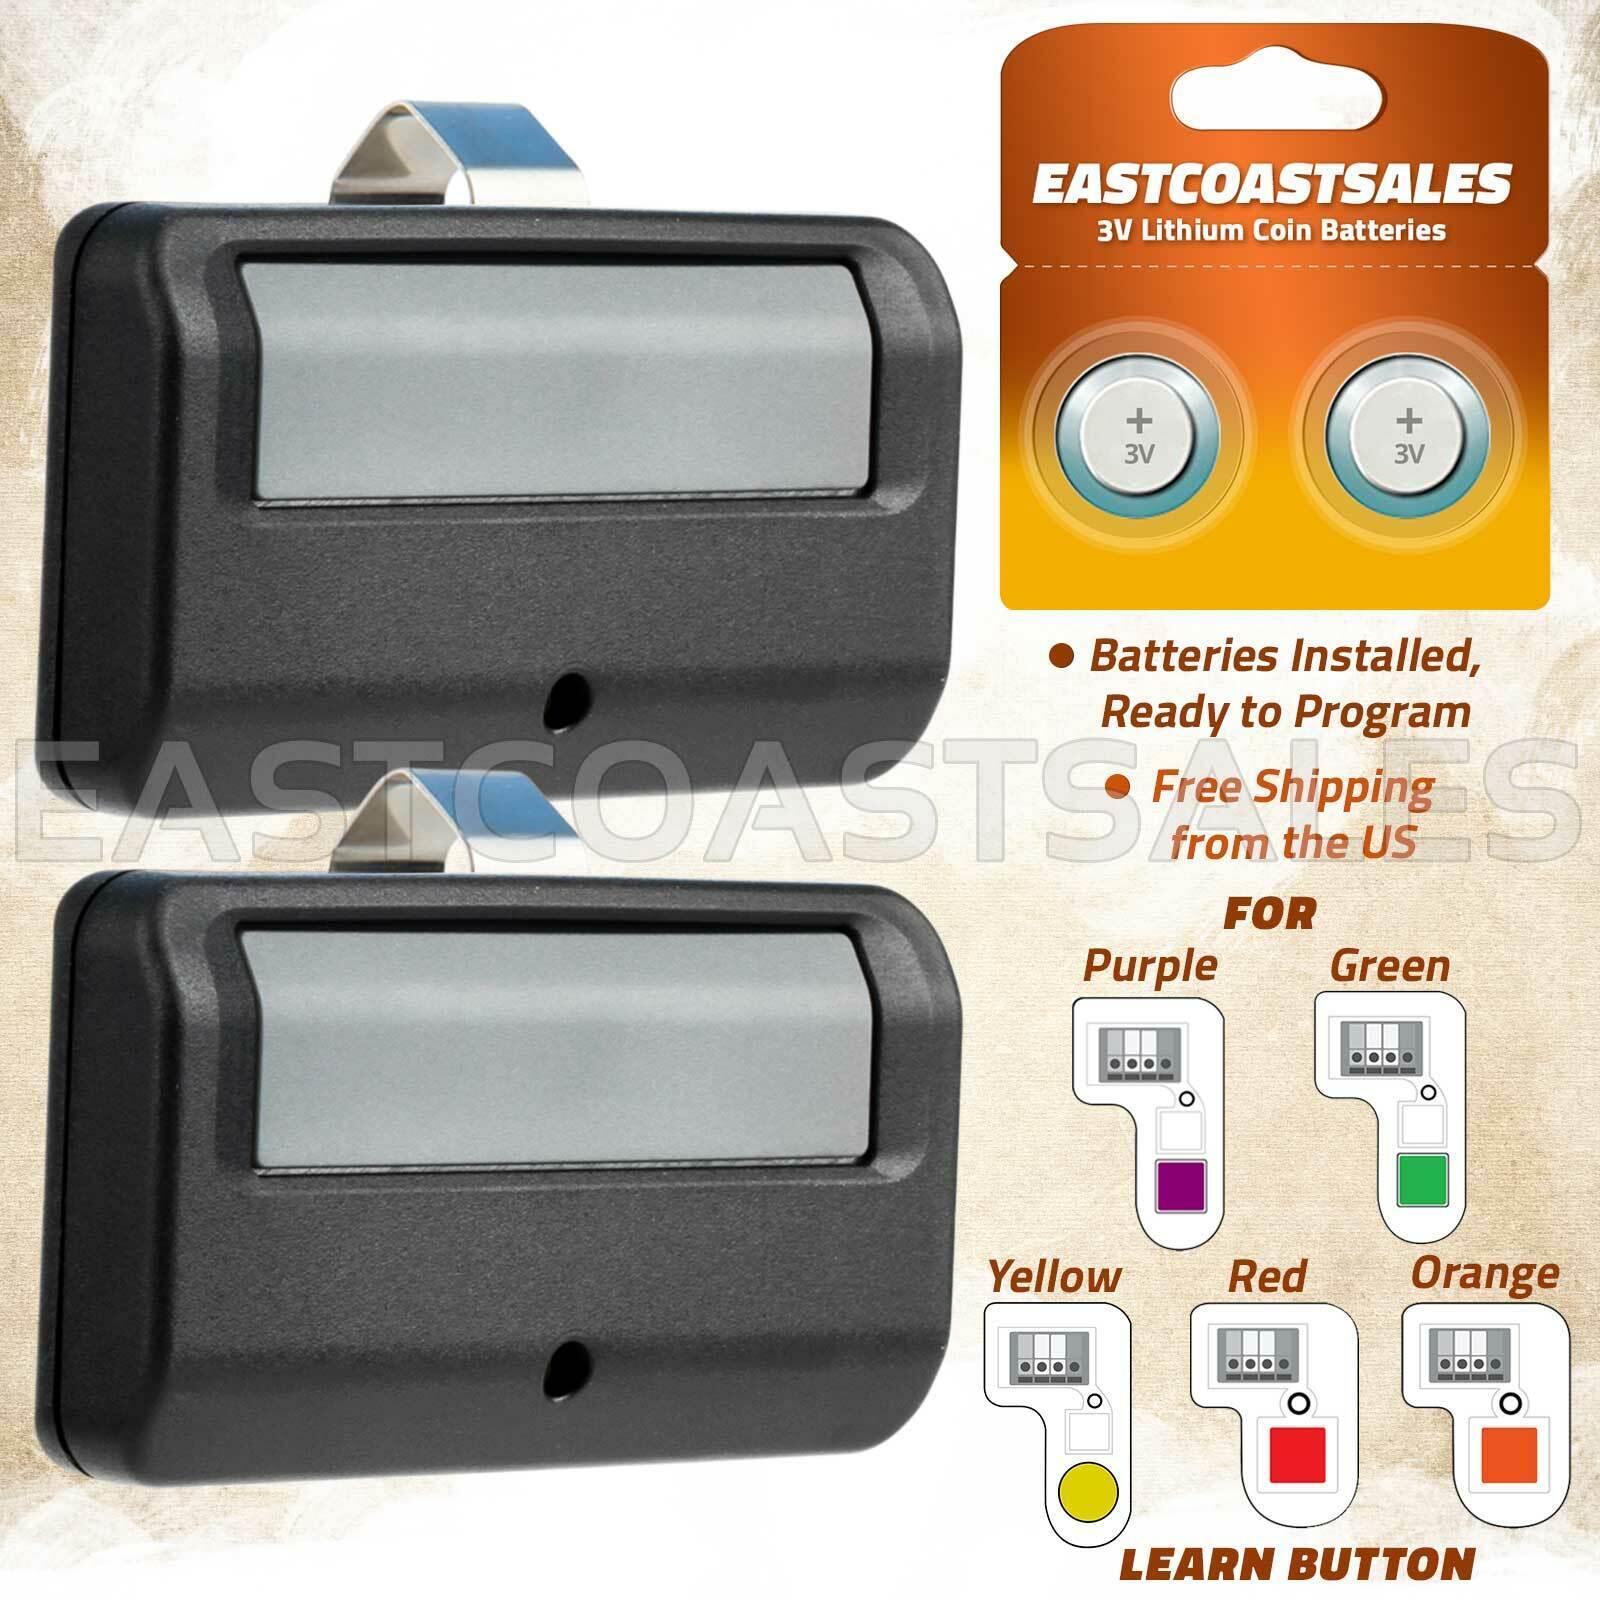 Chamberlain 67lm 67lc Security Plus Keypad Garage Door Opener For Sale Online Ebay